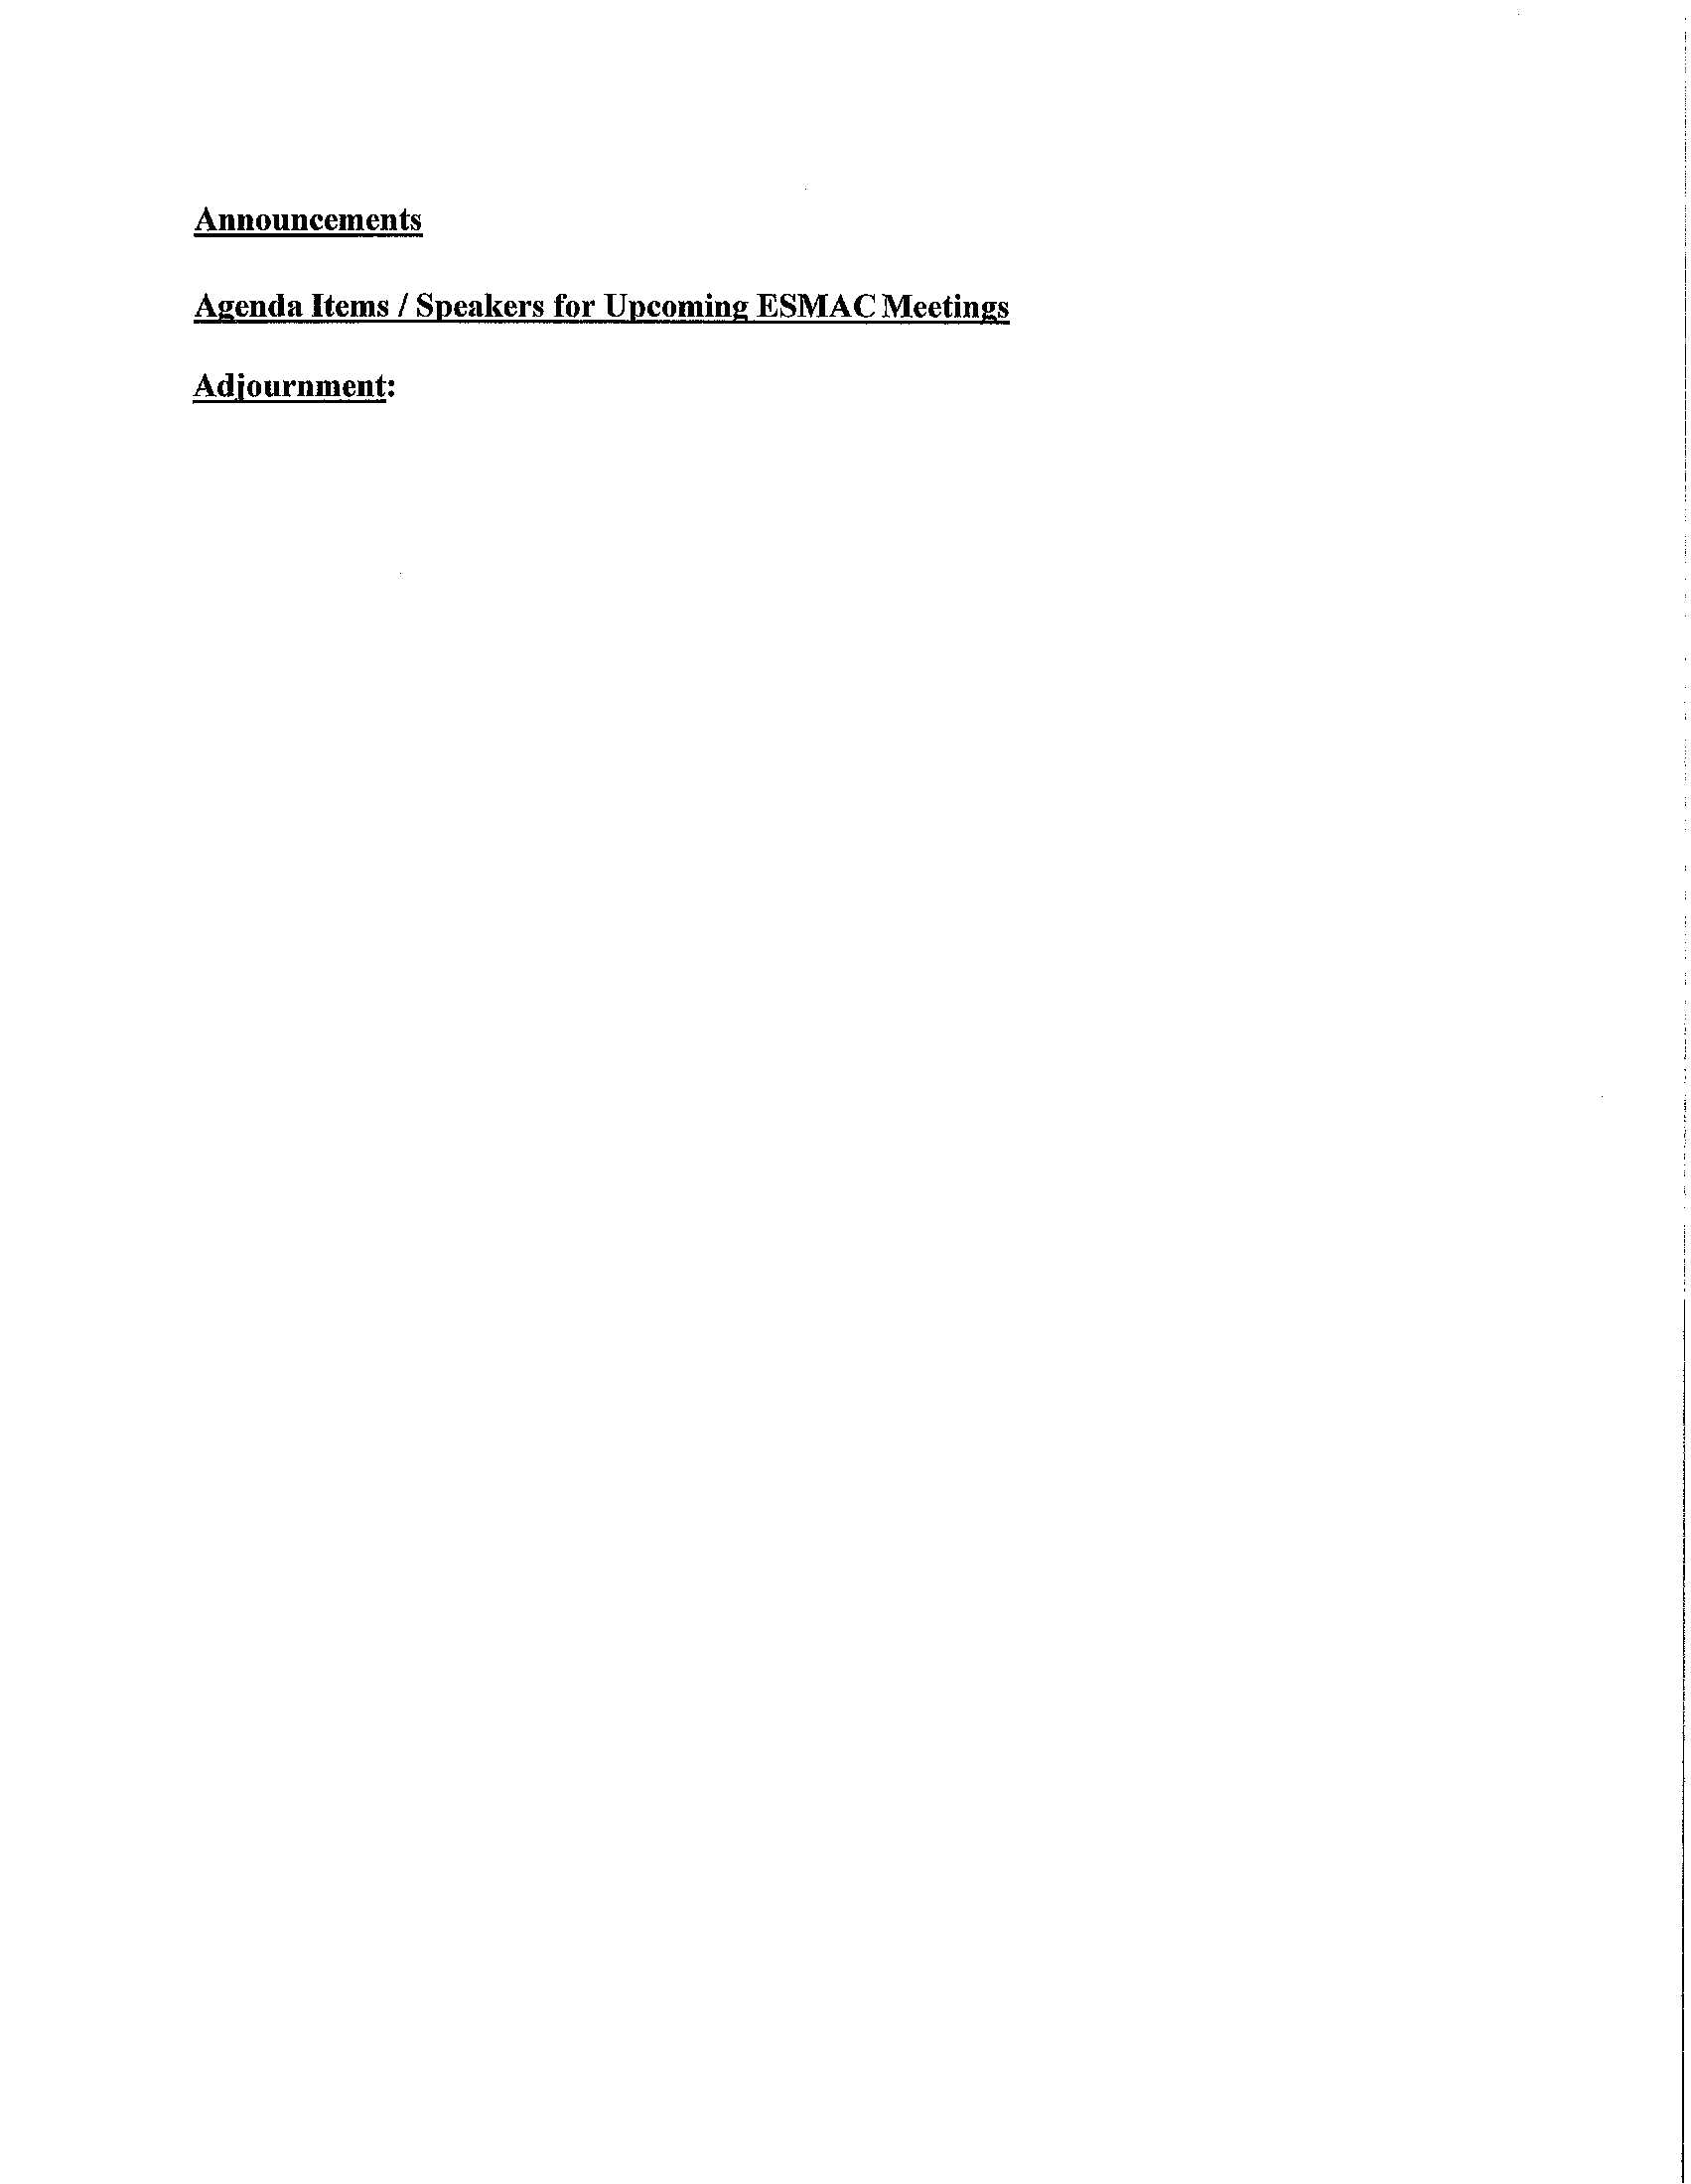 ESMAC Agenda 6.13.2018 (30 Pages)_3.jpg